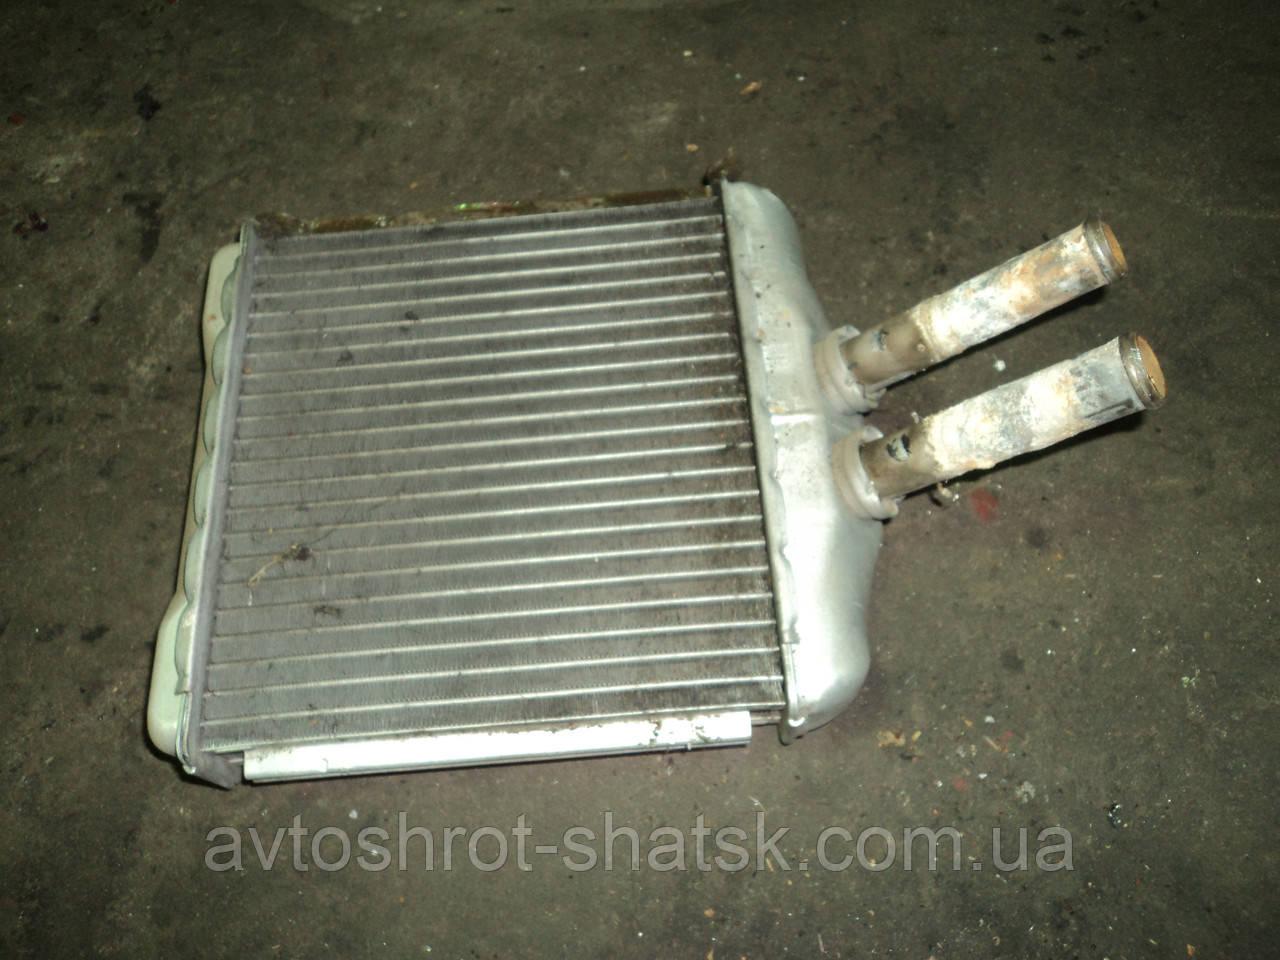 Радиатор печки на Daewoo Lanos